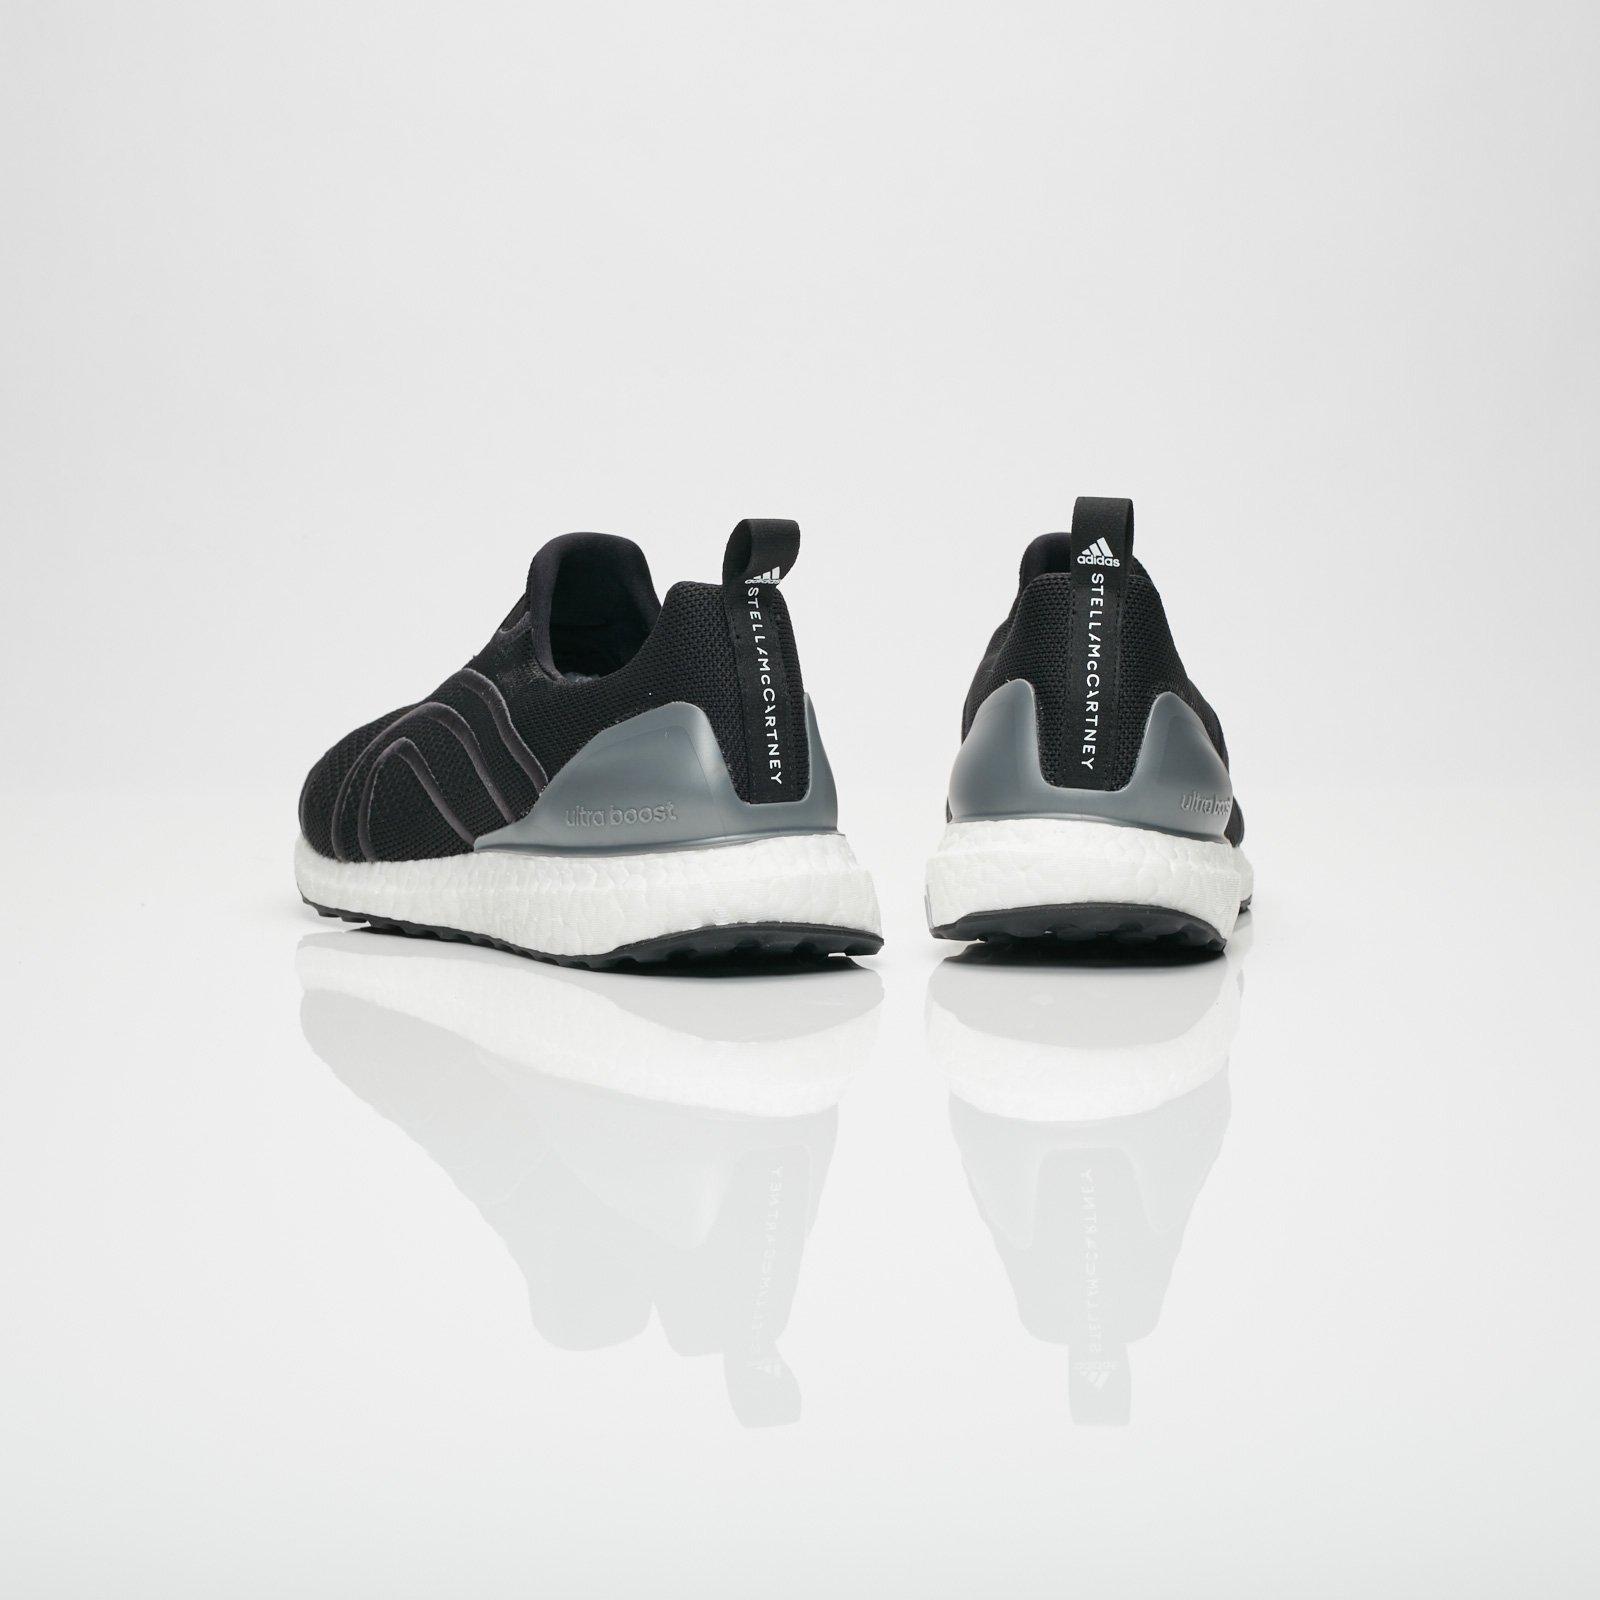 101d89ad7c97e adidas UltraBOOST Uncaged - Bb6273 - Sneakersnstuff